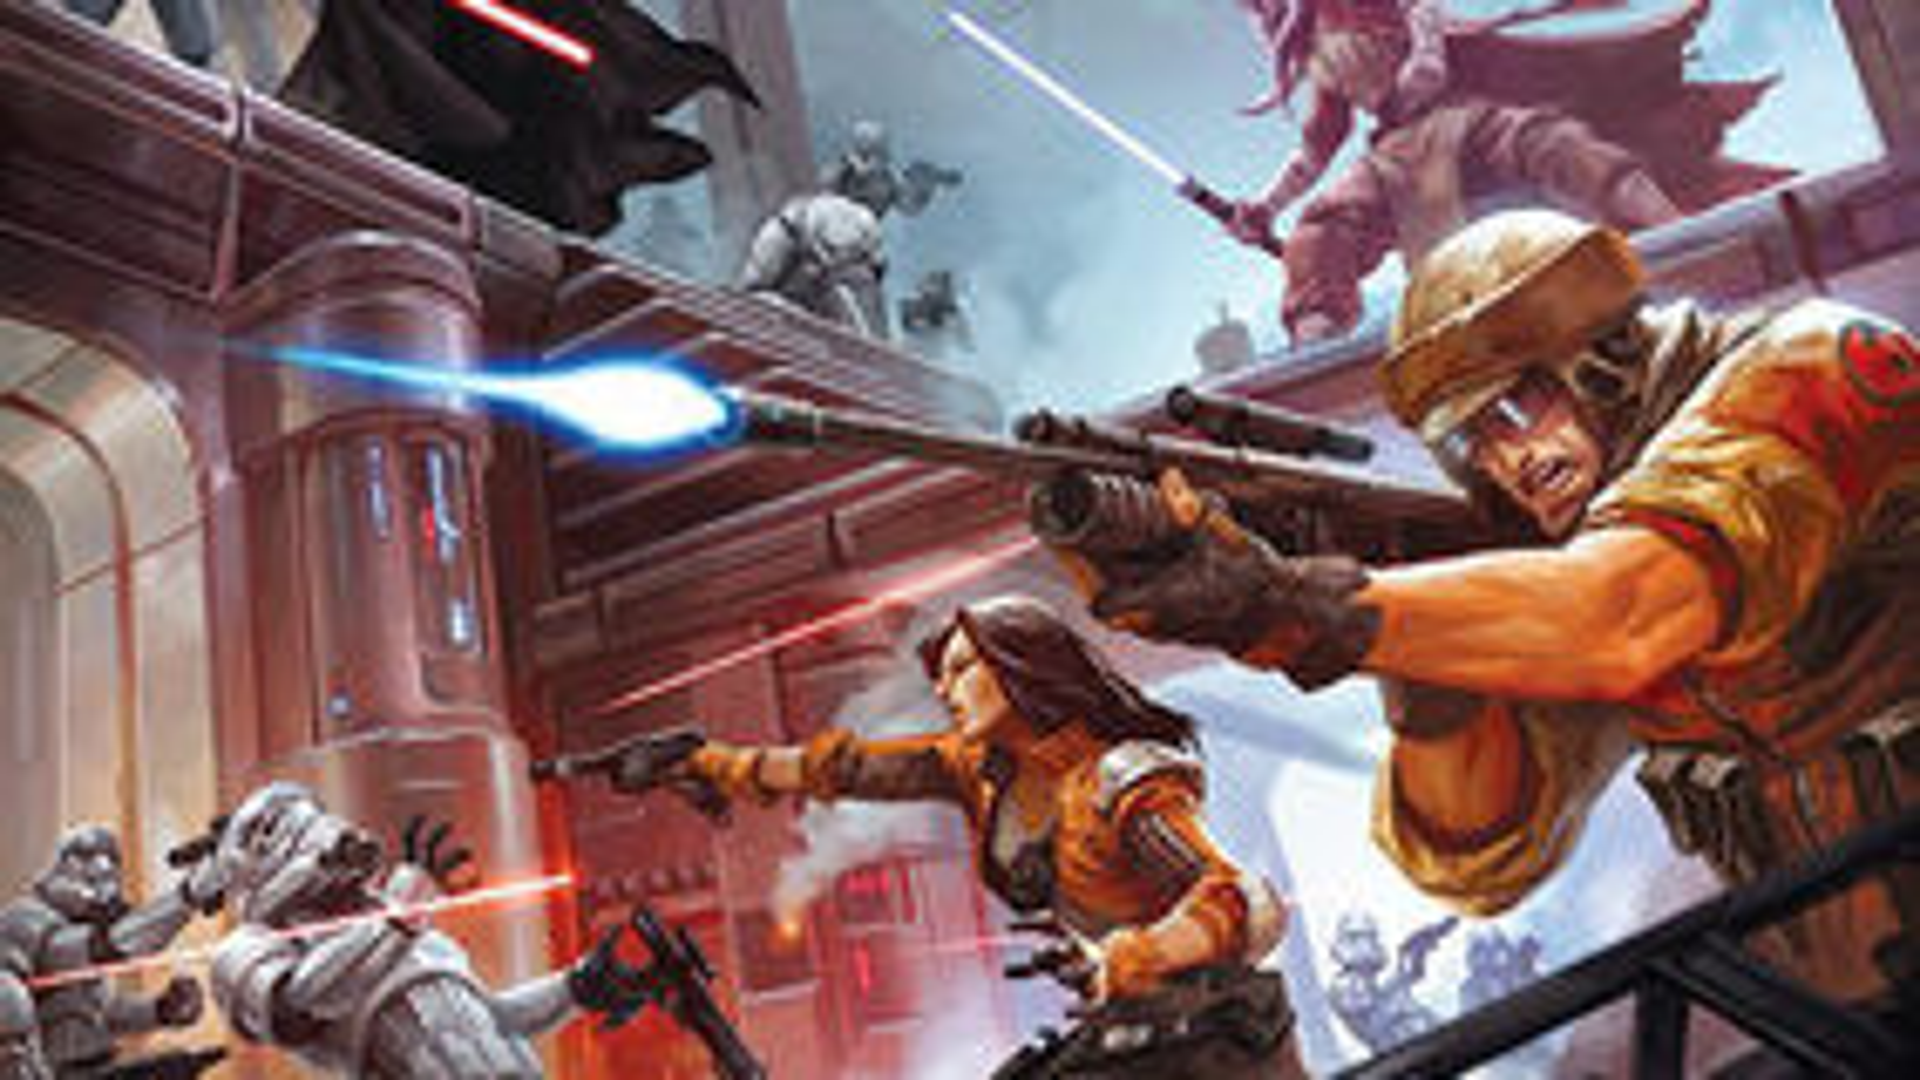 Star Wars: Imperial Assault board game artwork